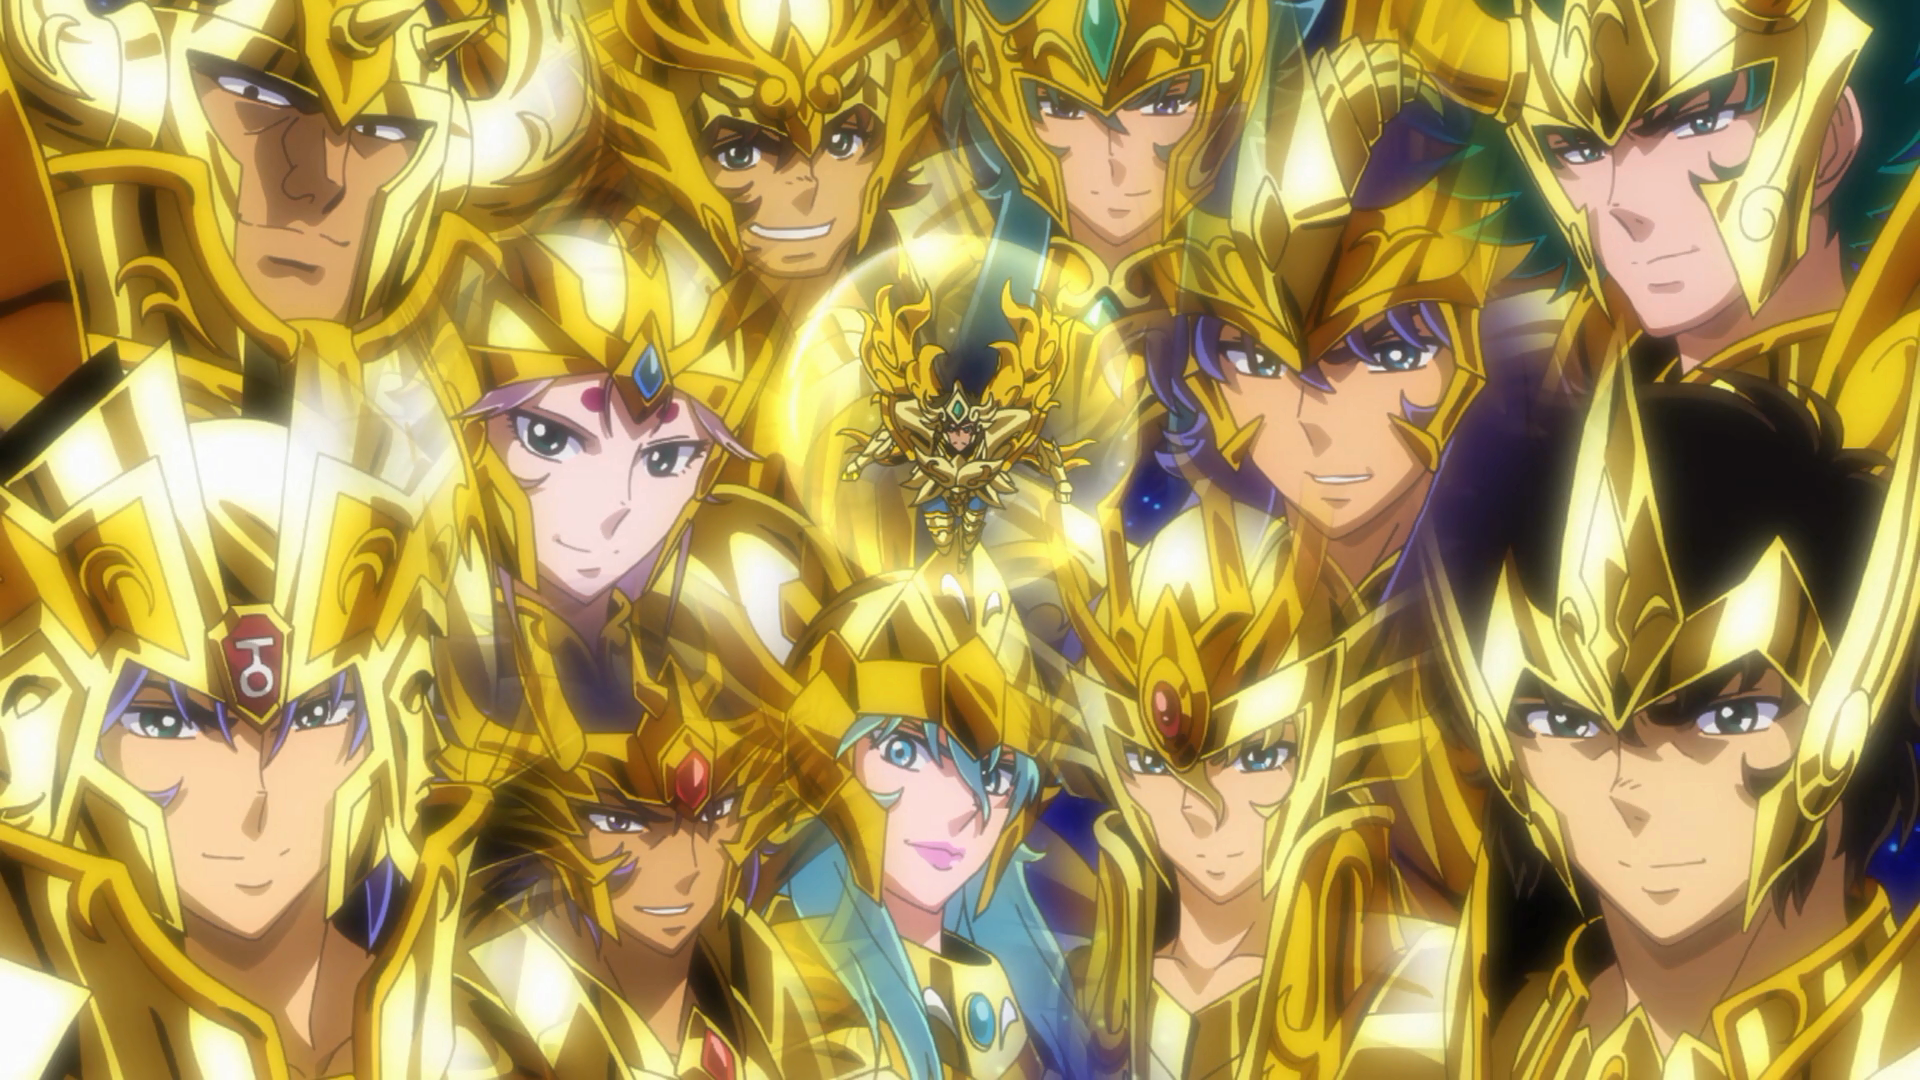 Cavaleiros Do Zodiaco Soul Of Gold Ep 13 Final O Mais Perto